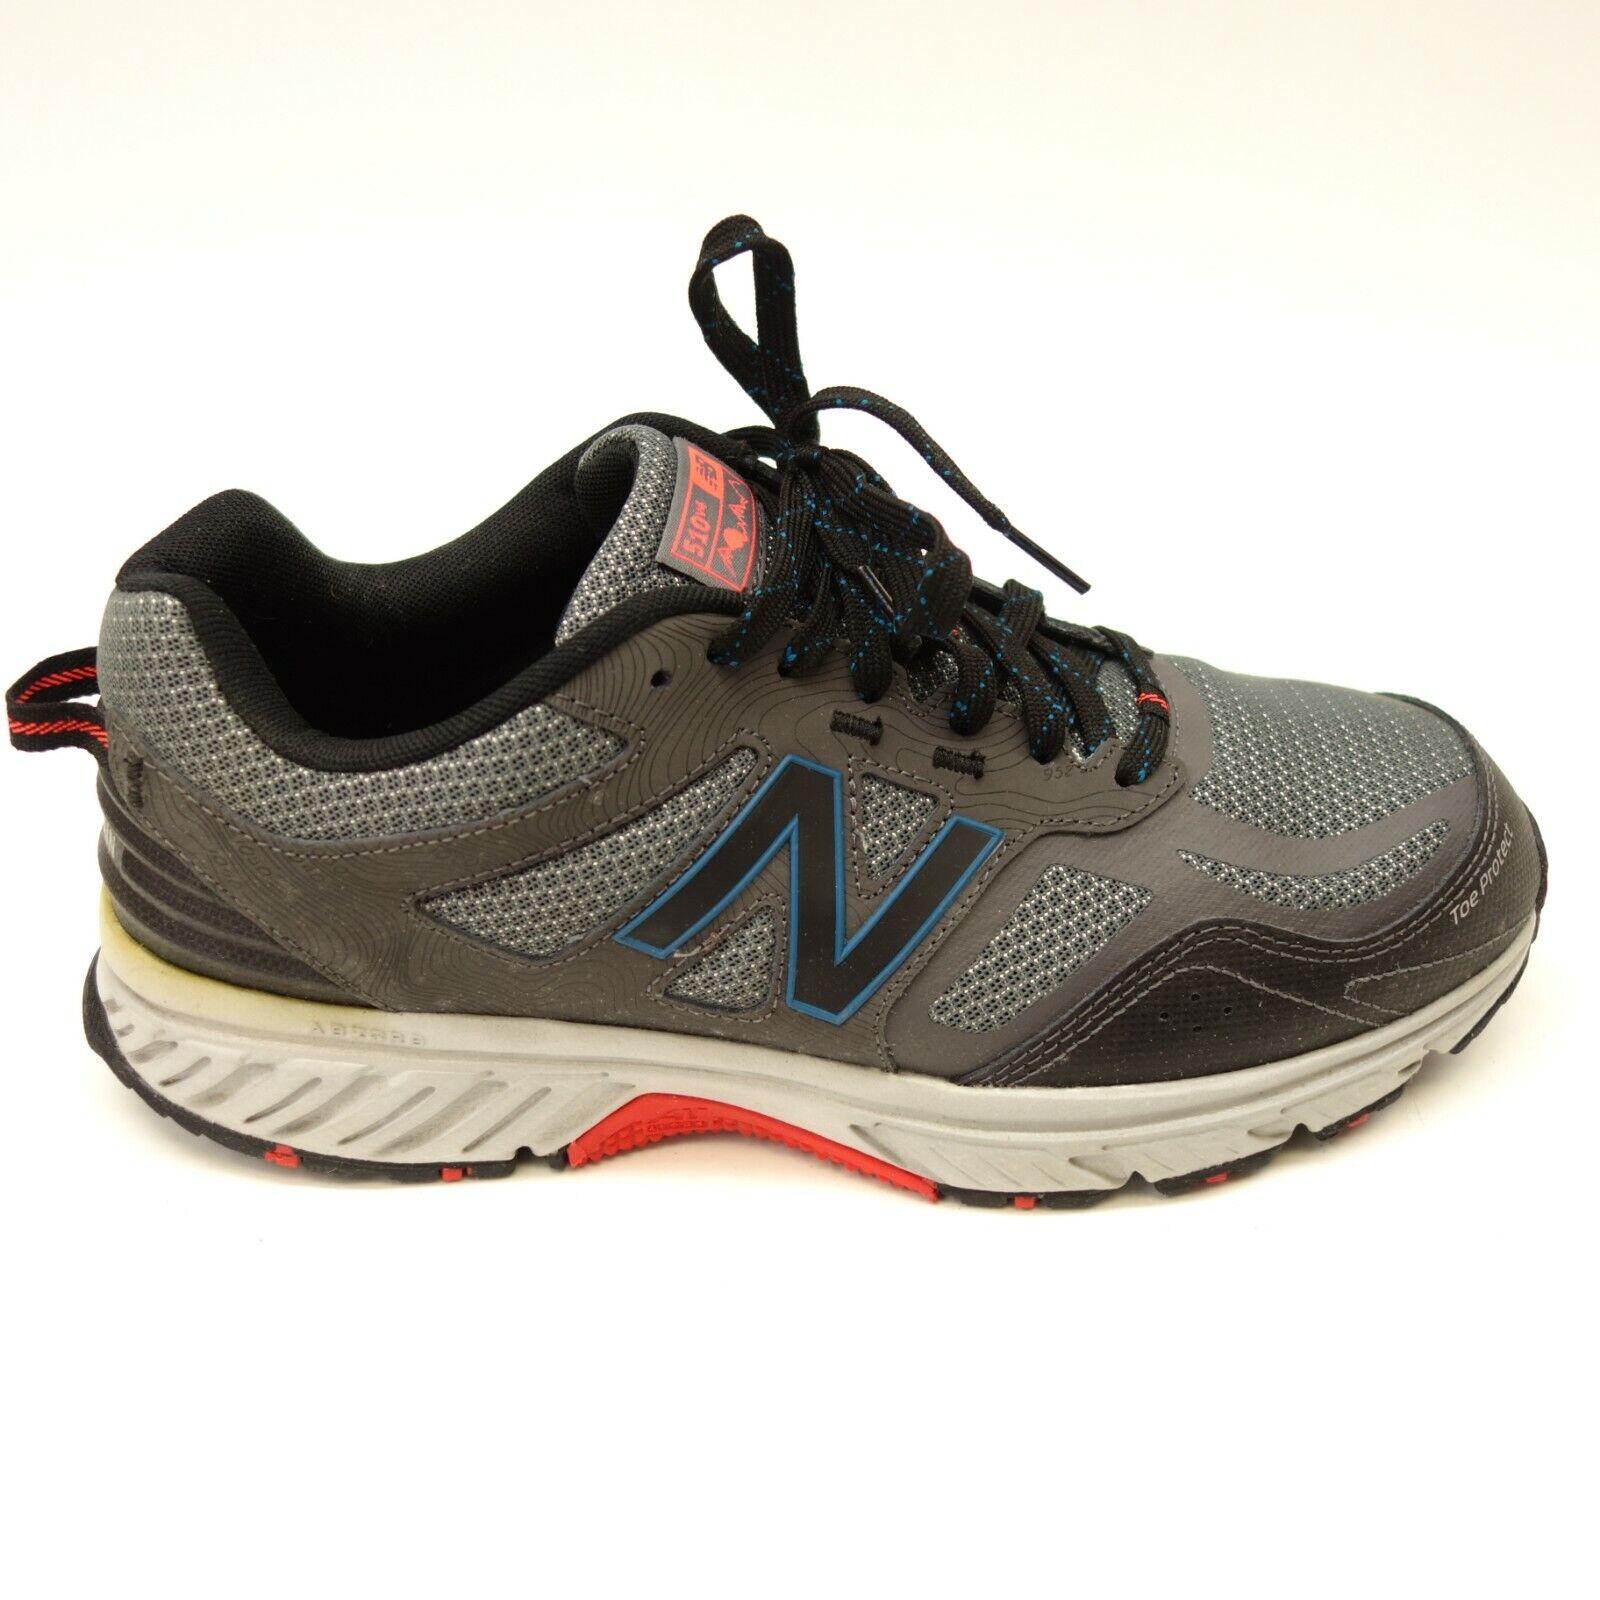 New Balance Herren 510 V4 Grau Ortholite Athletic Gesundheit Wanderschuhe Größe